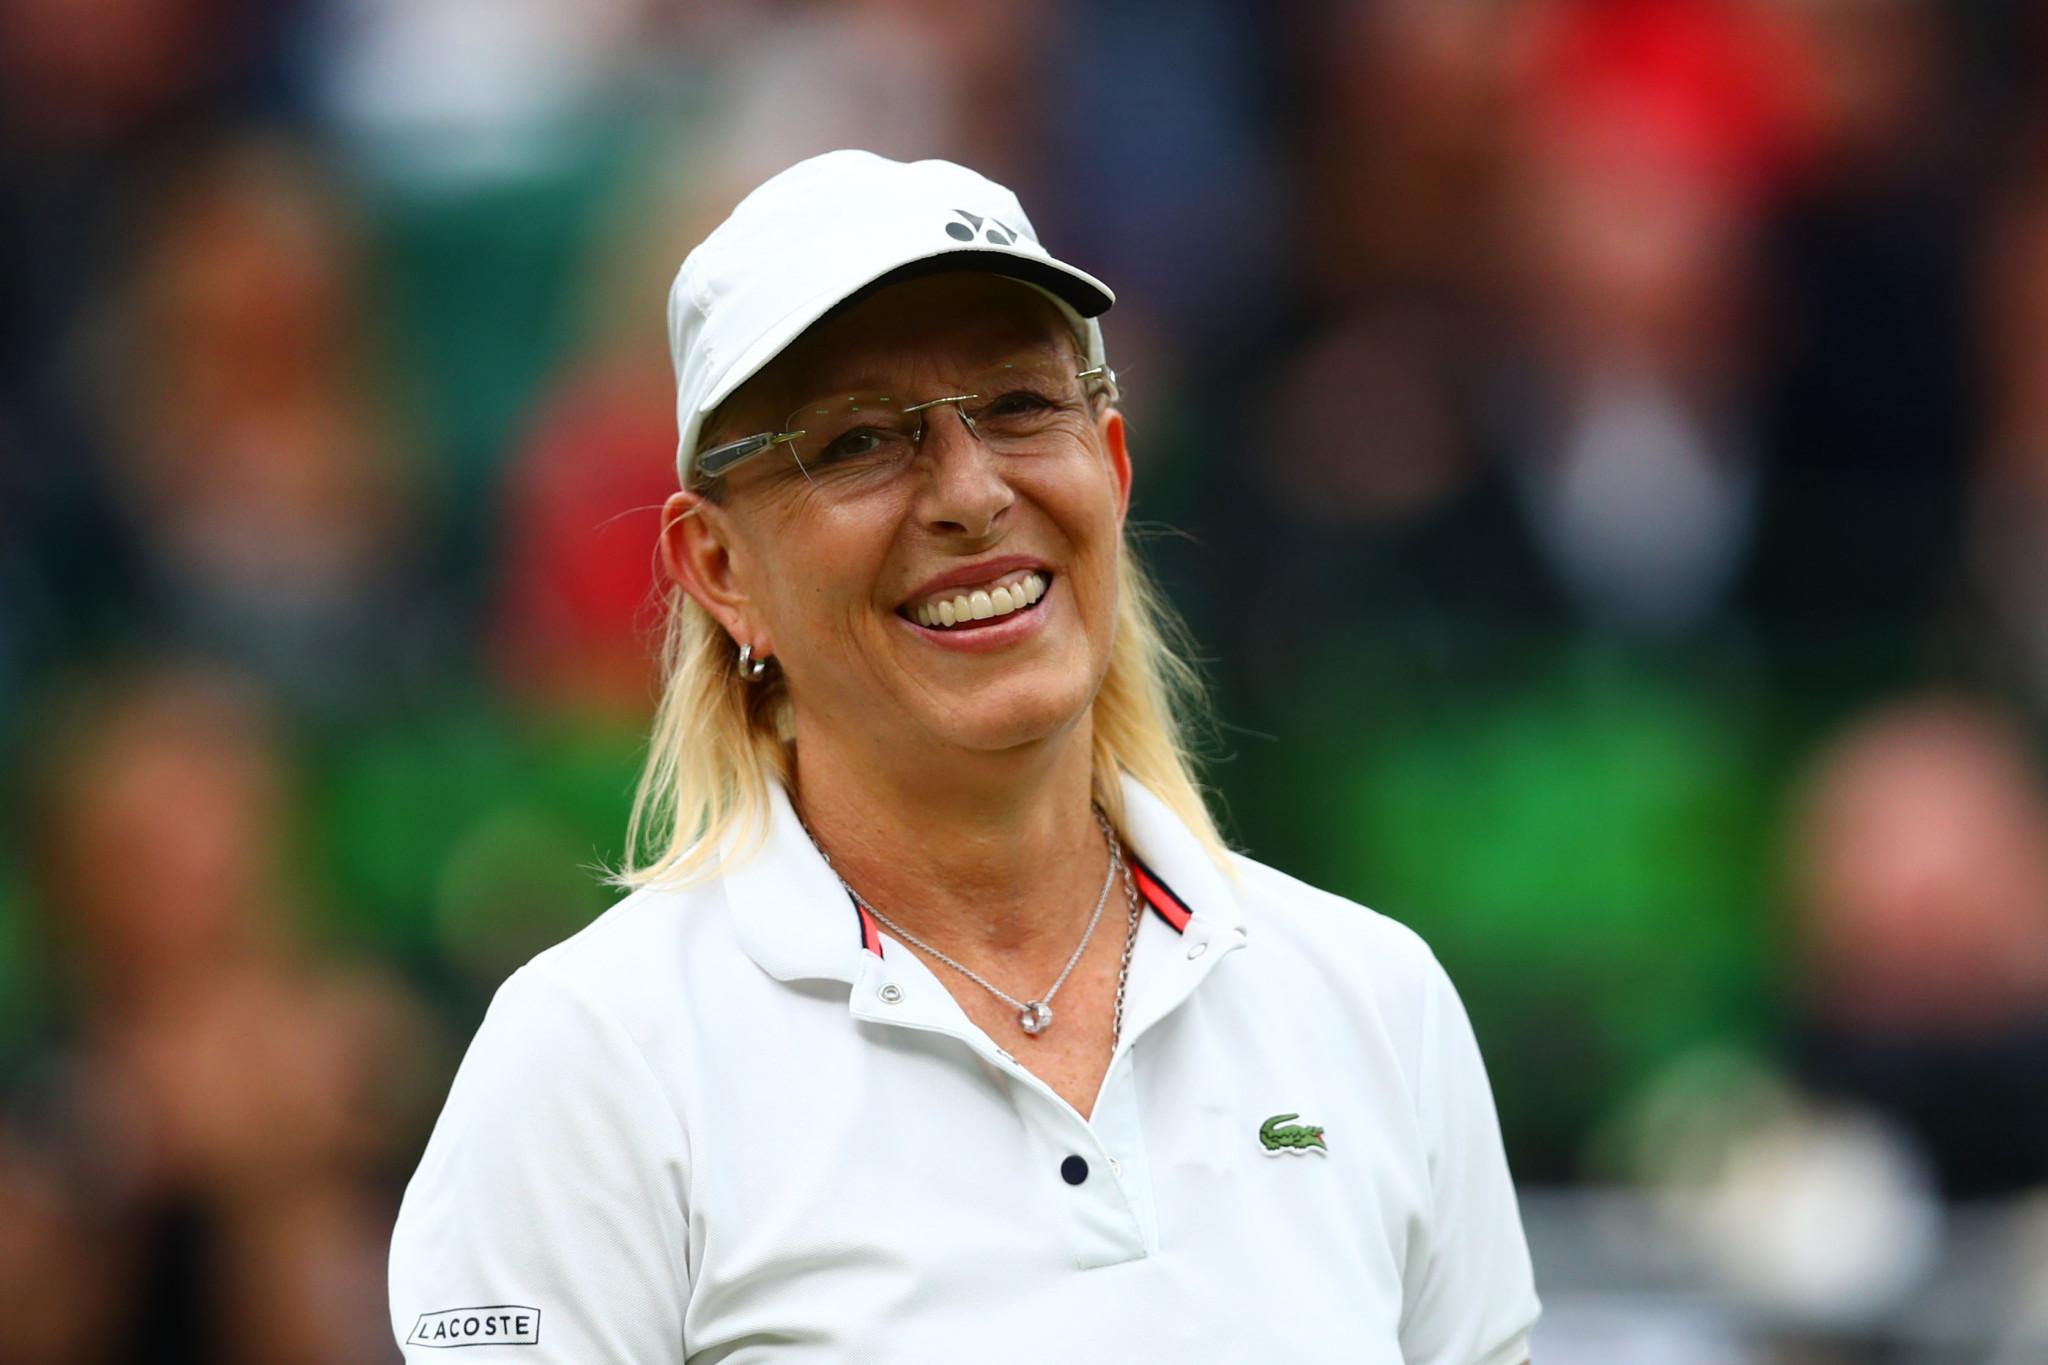 Martina Navratilova won 18 Grand Slam titles, and is among the sporting legends to back Petr Bříza's bid ©Getty Images